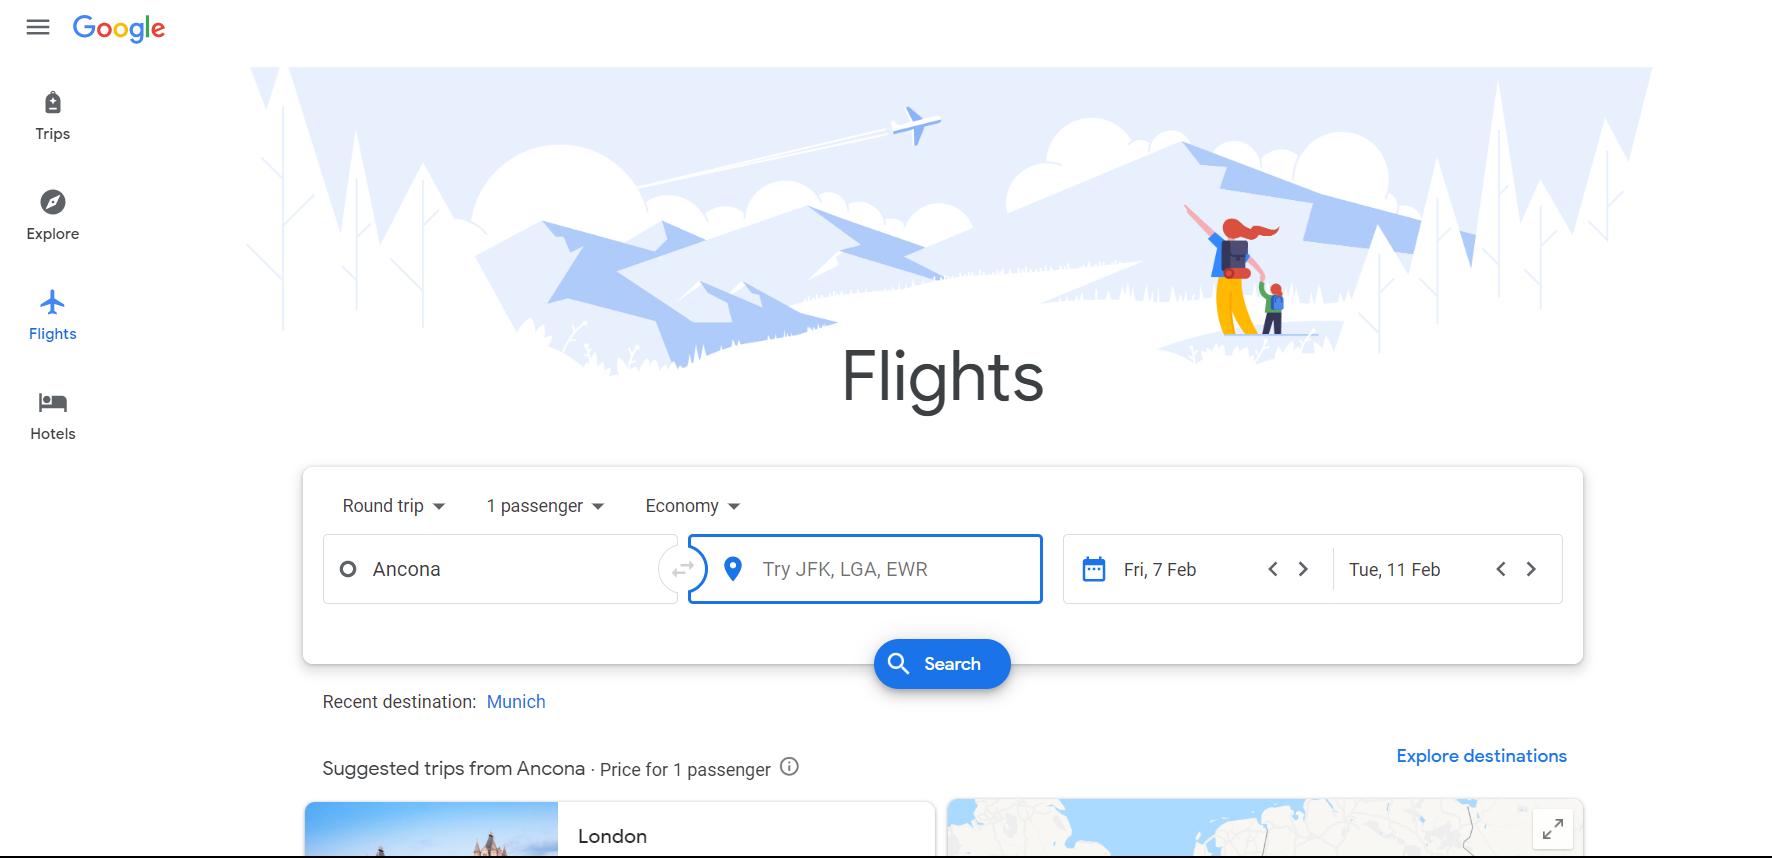 google travel_opportunità_hotel manager e albergatori _flights